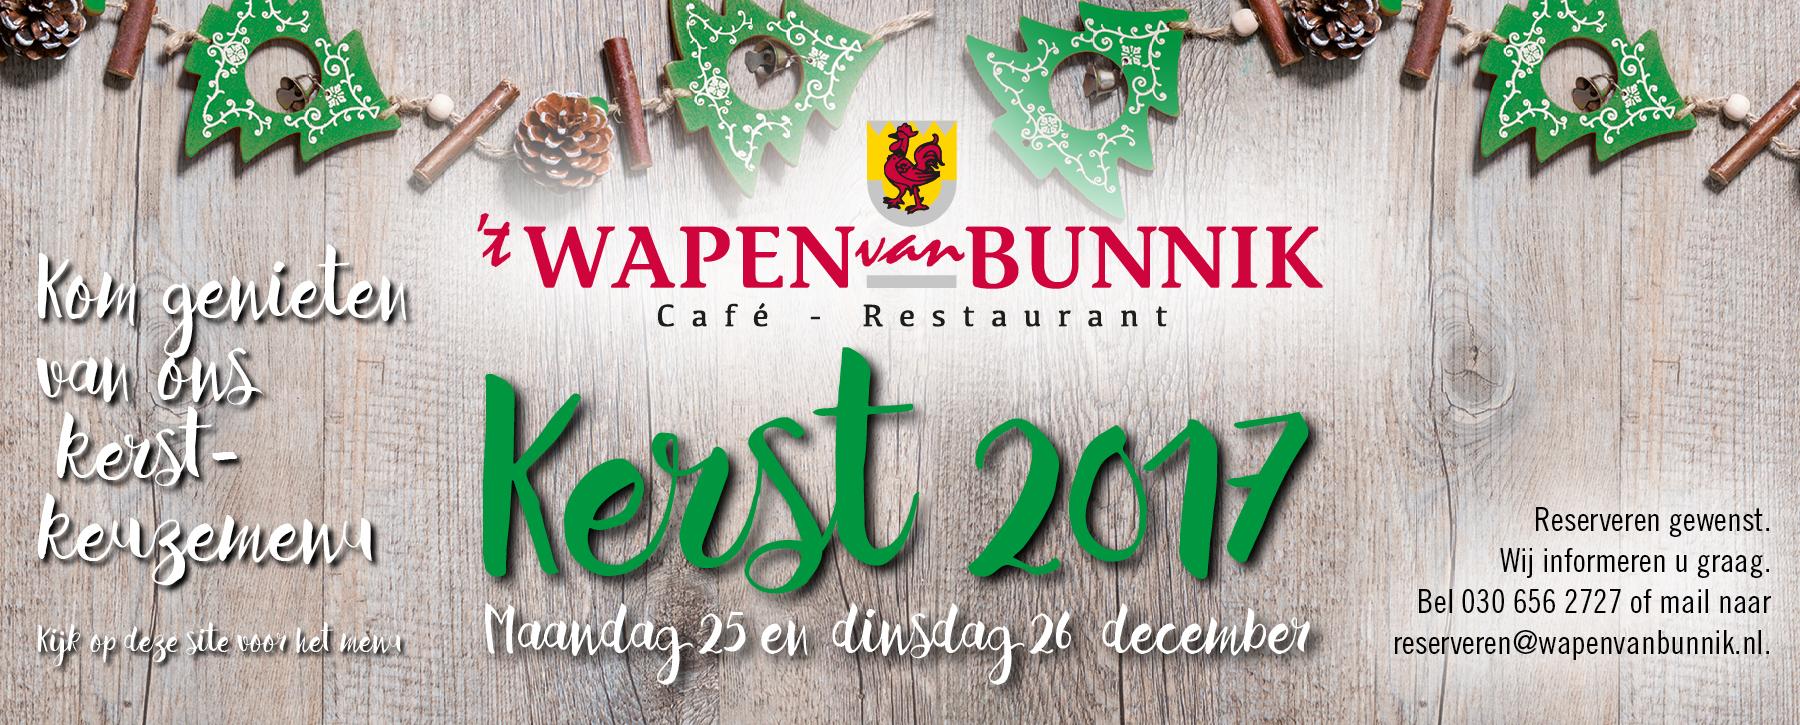 Kerstmenu 2017 - 't Wapen van Bunnik